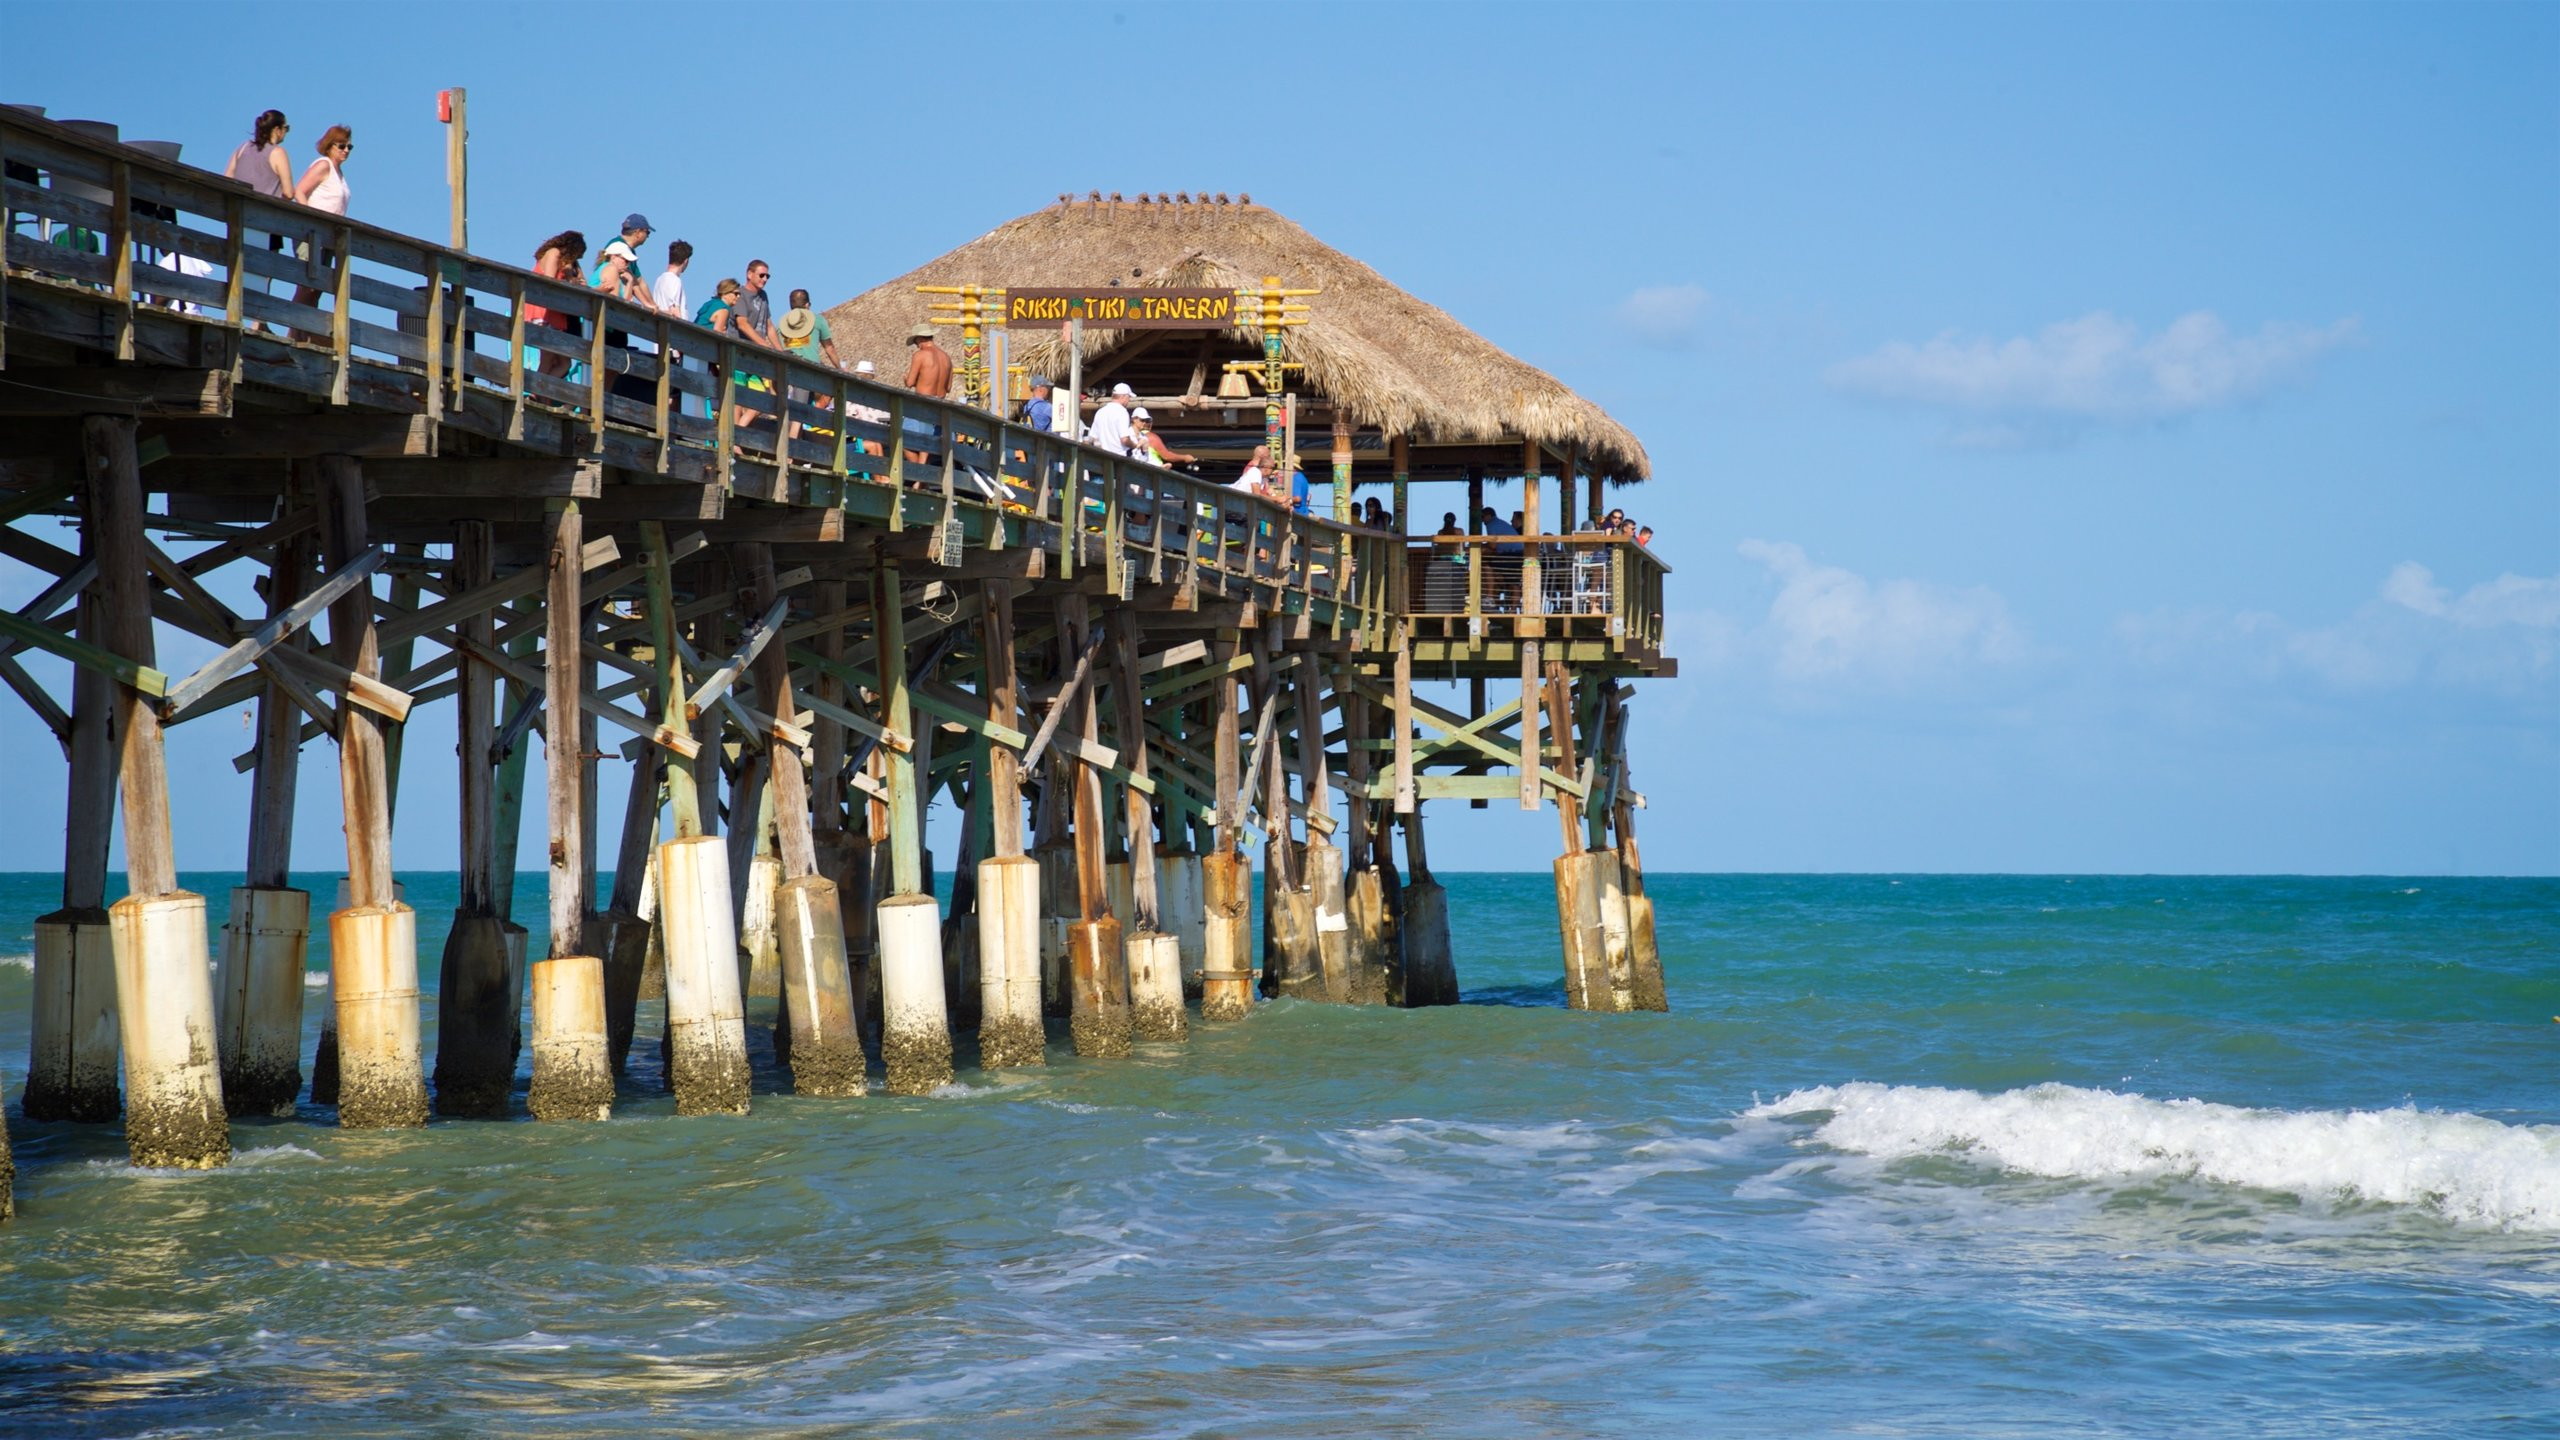 Cocoa Beach, Florida, United States of America